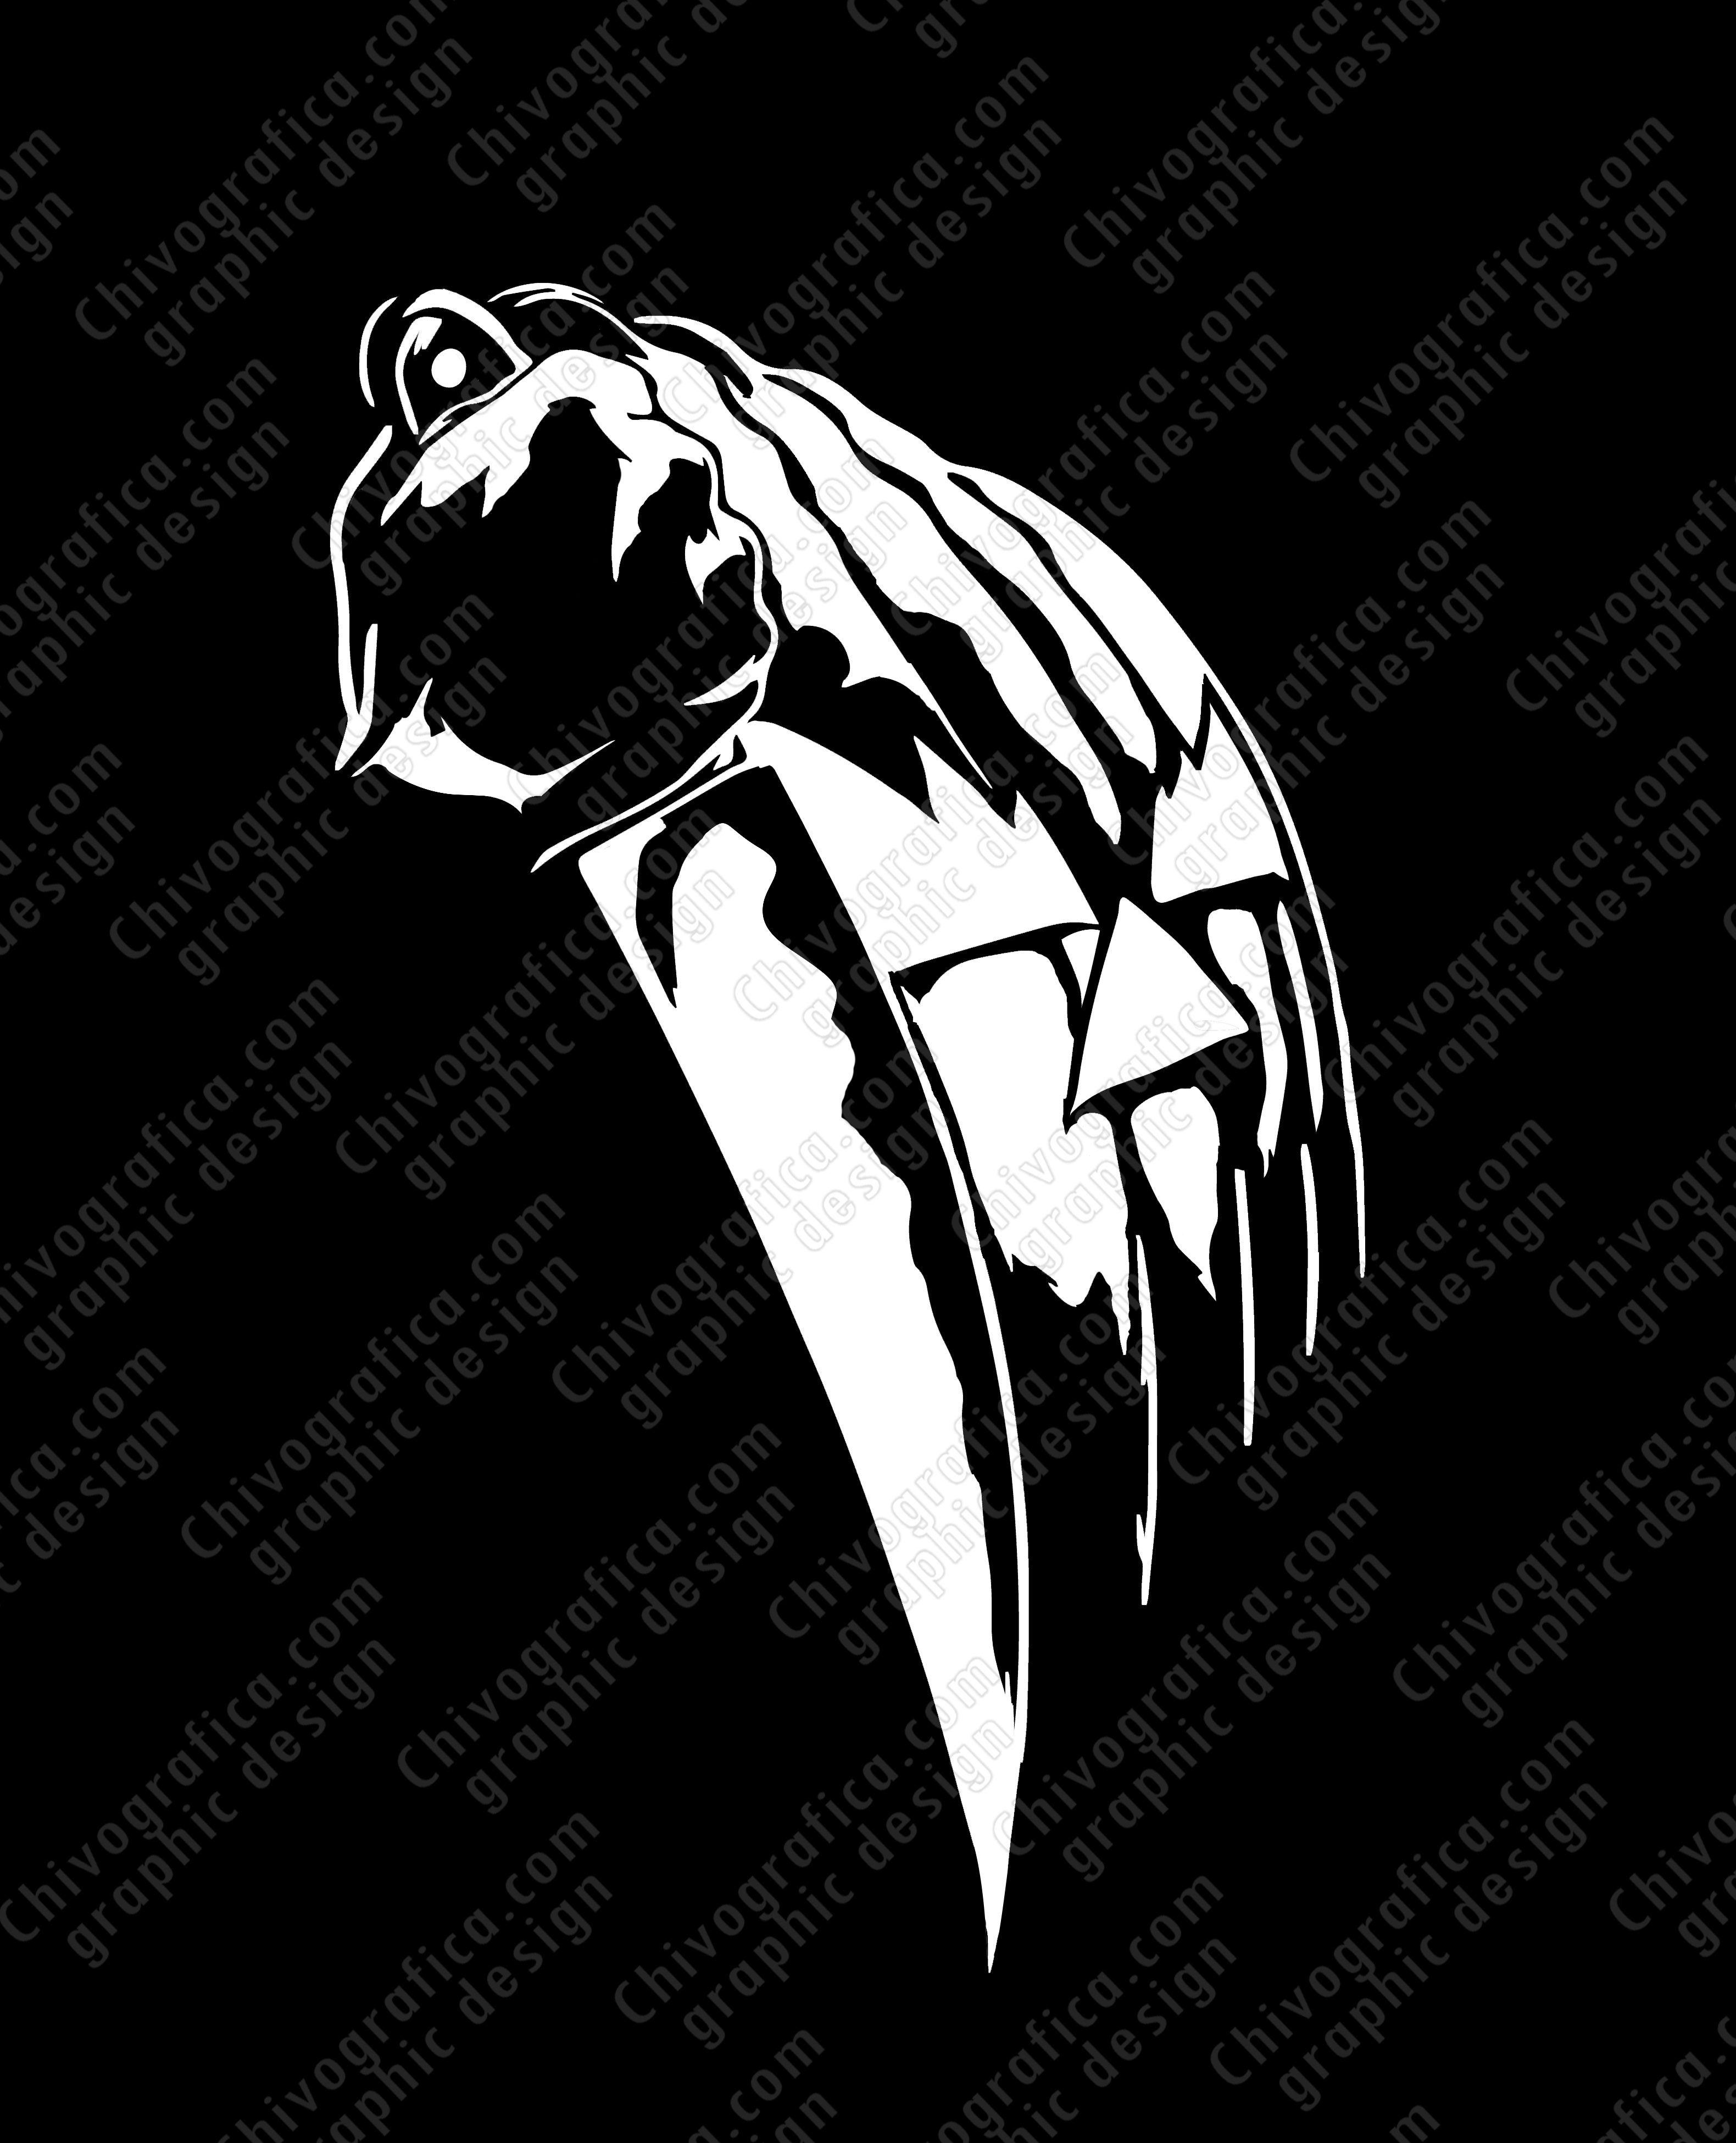 Halloween Michael Myers Horror Movie Decal Vinyl Sticker Michael Myers Art Michael Myers Michael Myers Halloween [ 3900 x 3160 Pixel ]